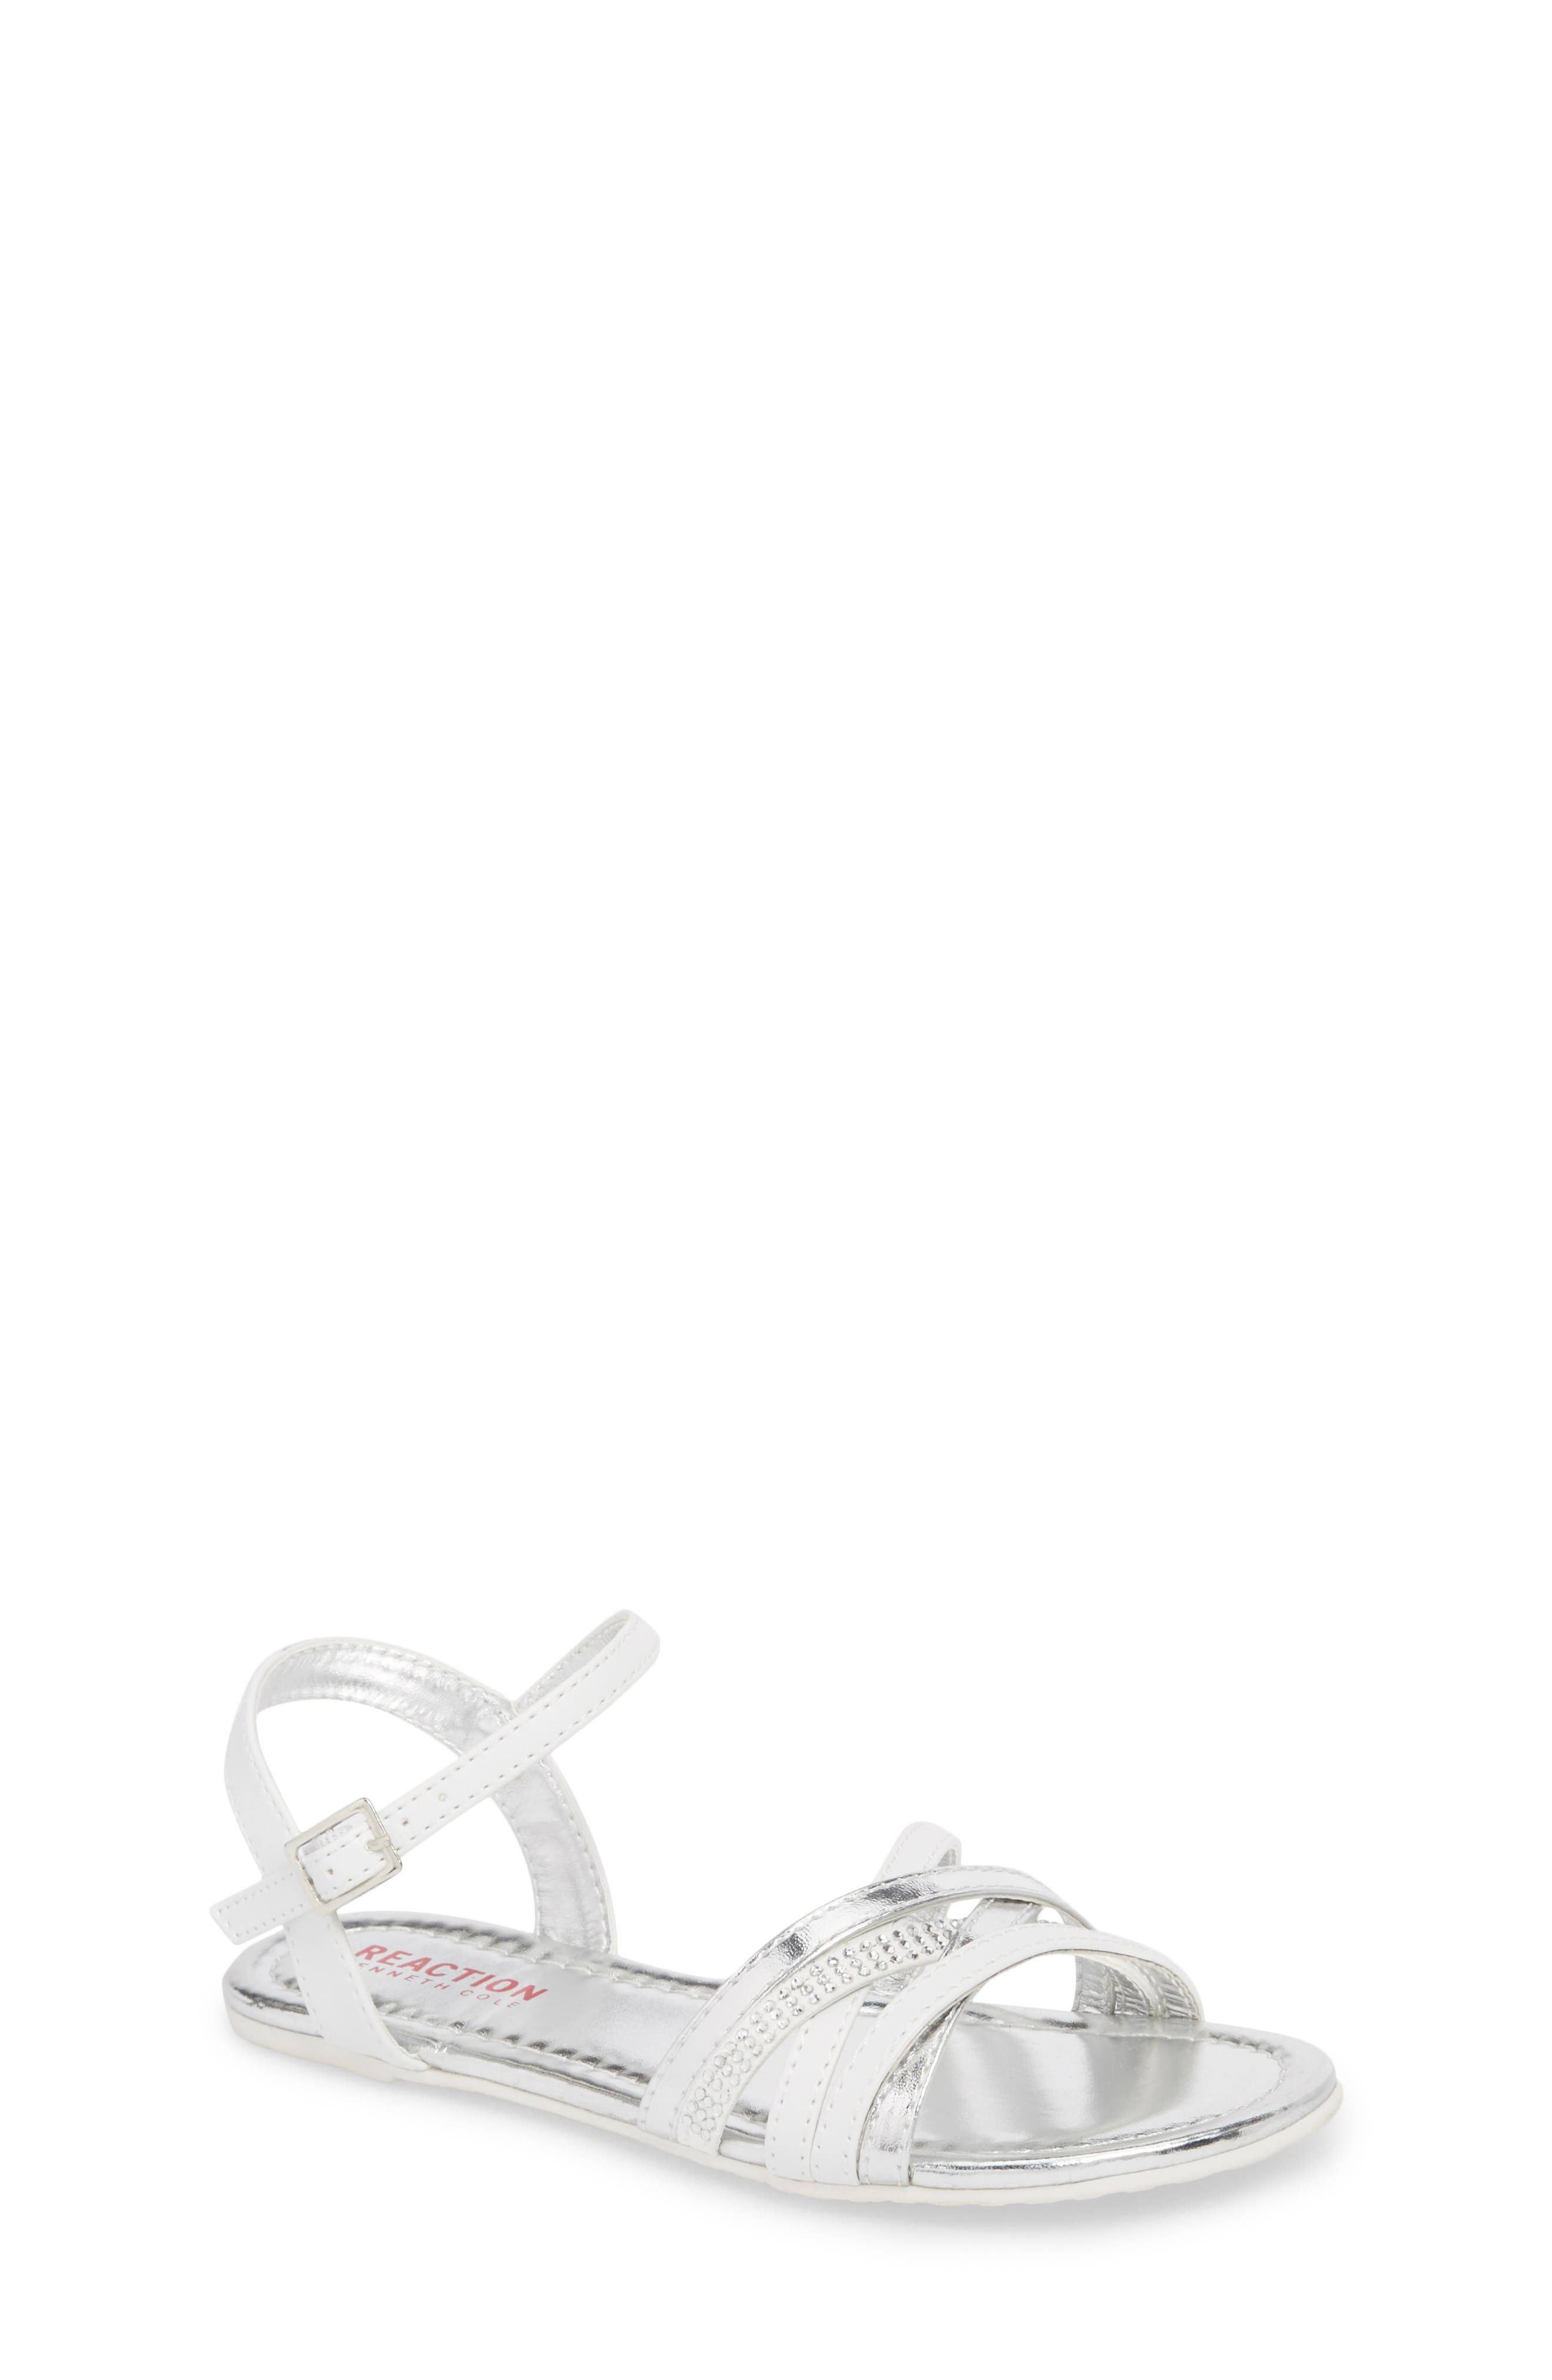 Kiera Getty Crystal Sandal,                             Main thumbnail 1, color,                             100